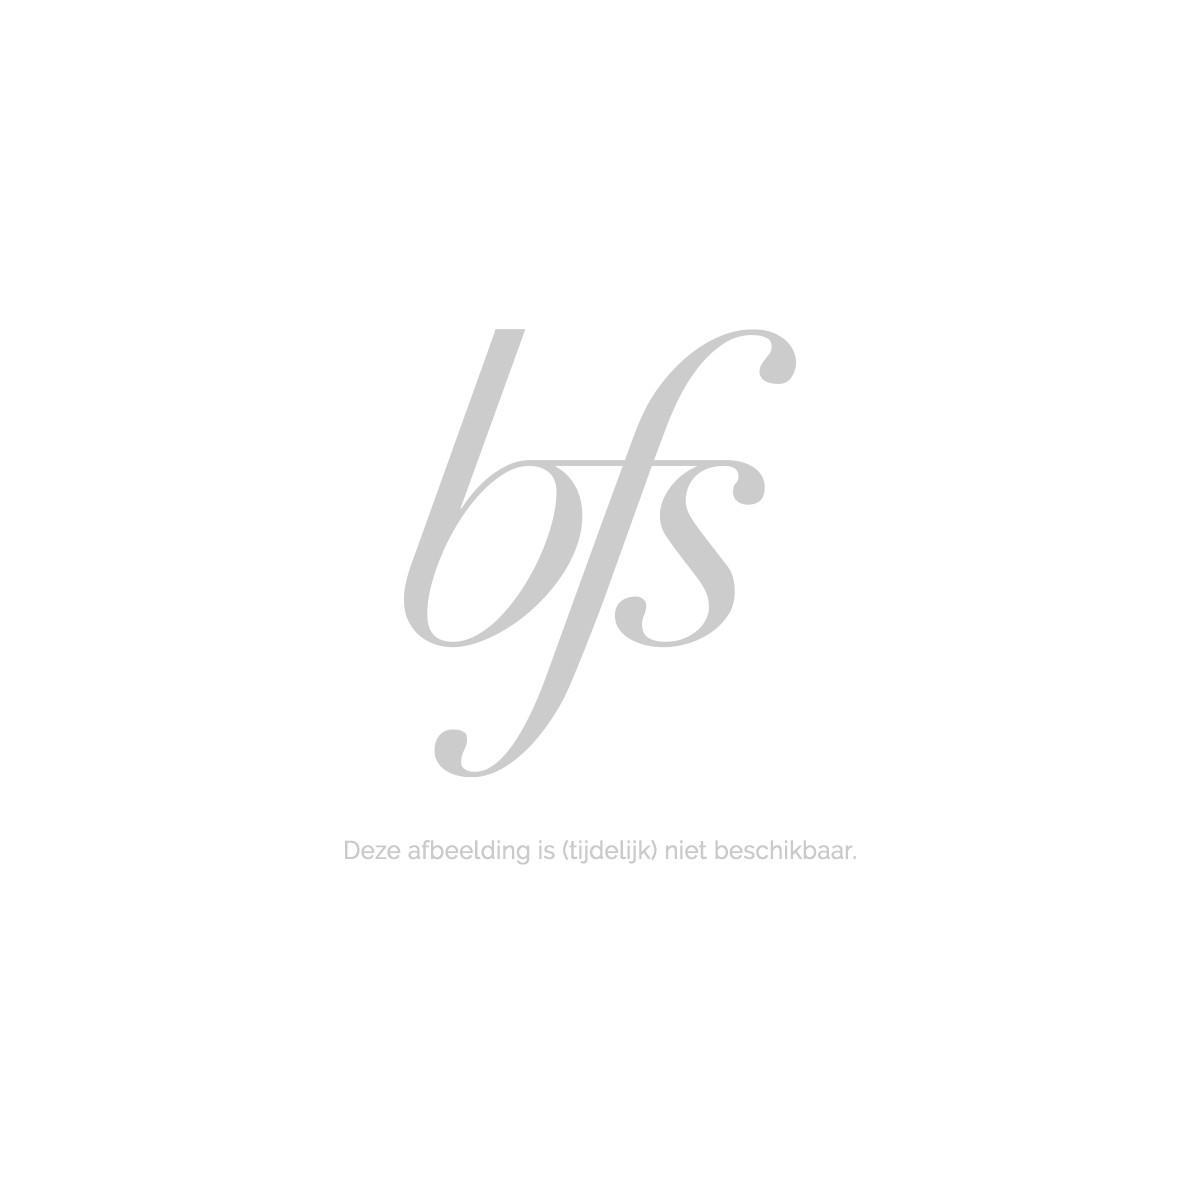 Pupa IM Matt Lipstick 032 Fancy Mauve